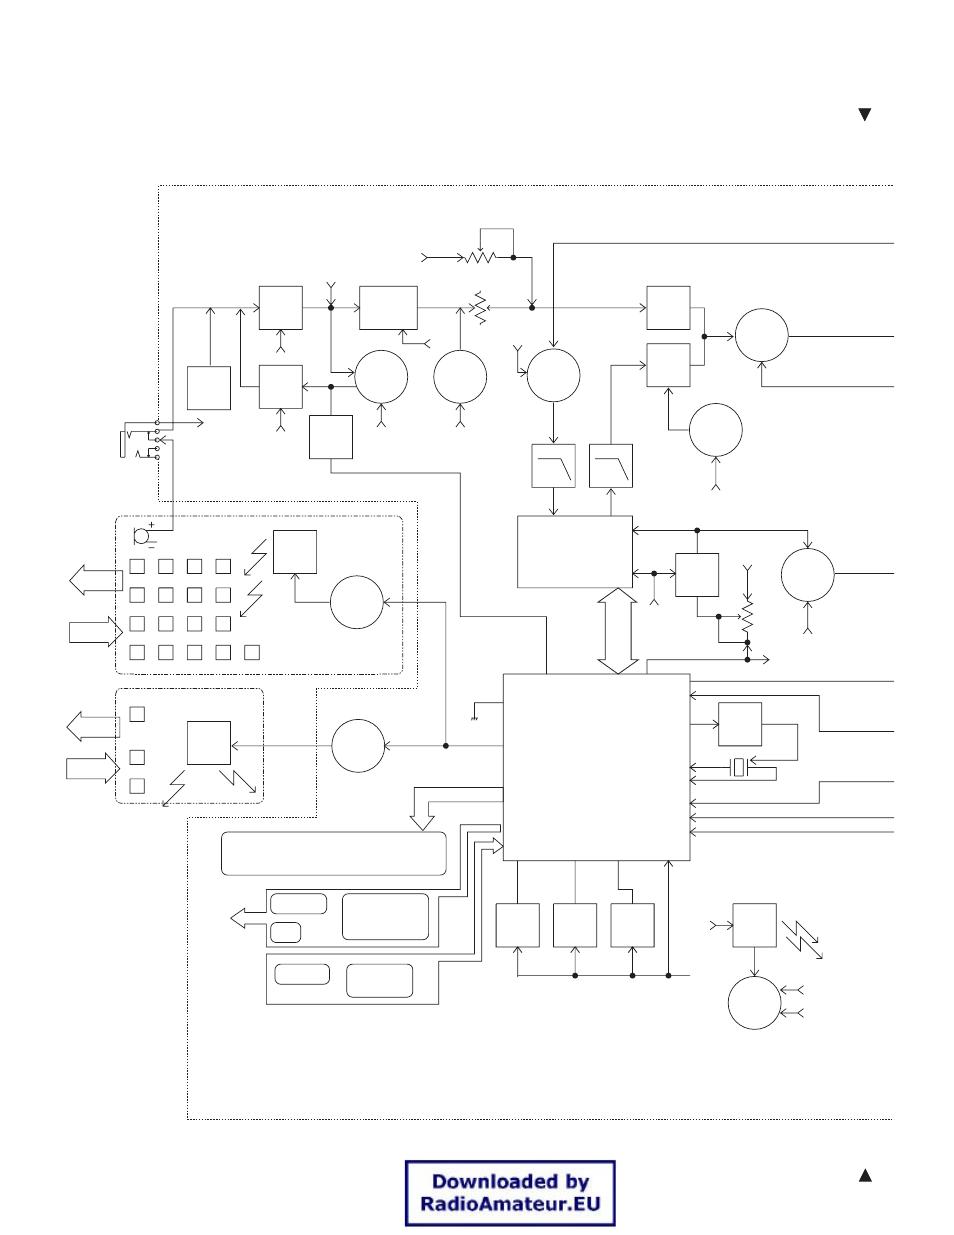 hight resolution of block diagram th k2at k2e k2et kenwood 144mhz fm transceiver k2e user manual page 59 63